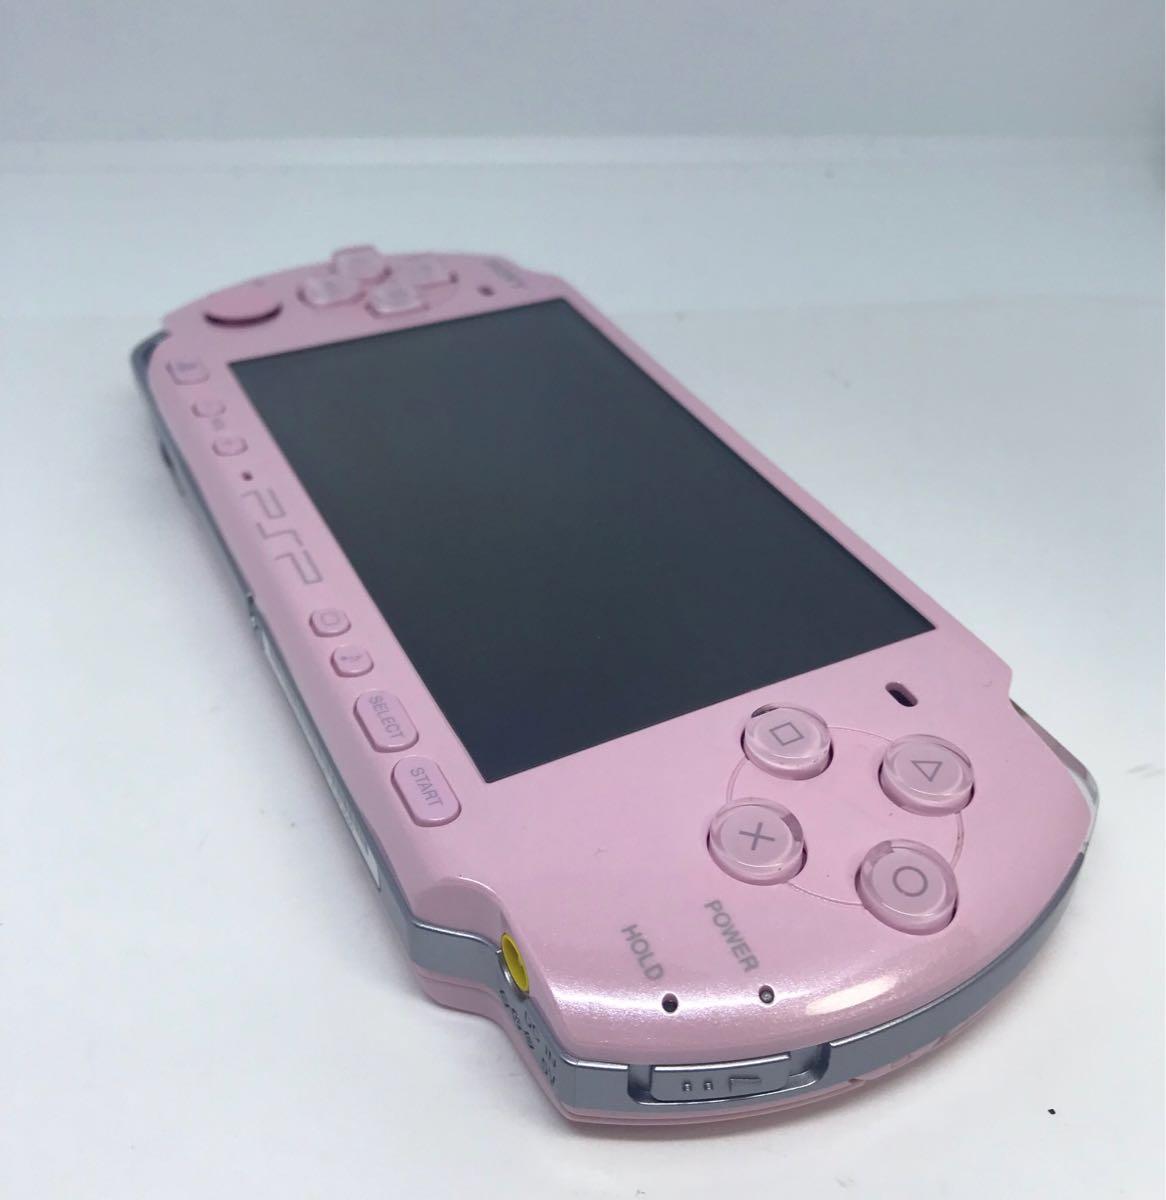 PSP 3000 本体 綺麗な美品!ピンク 動作確認済み品_画像5